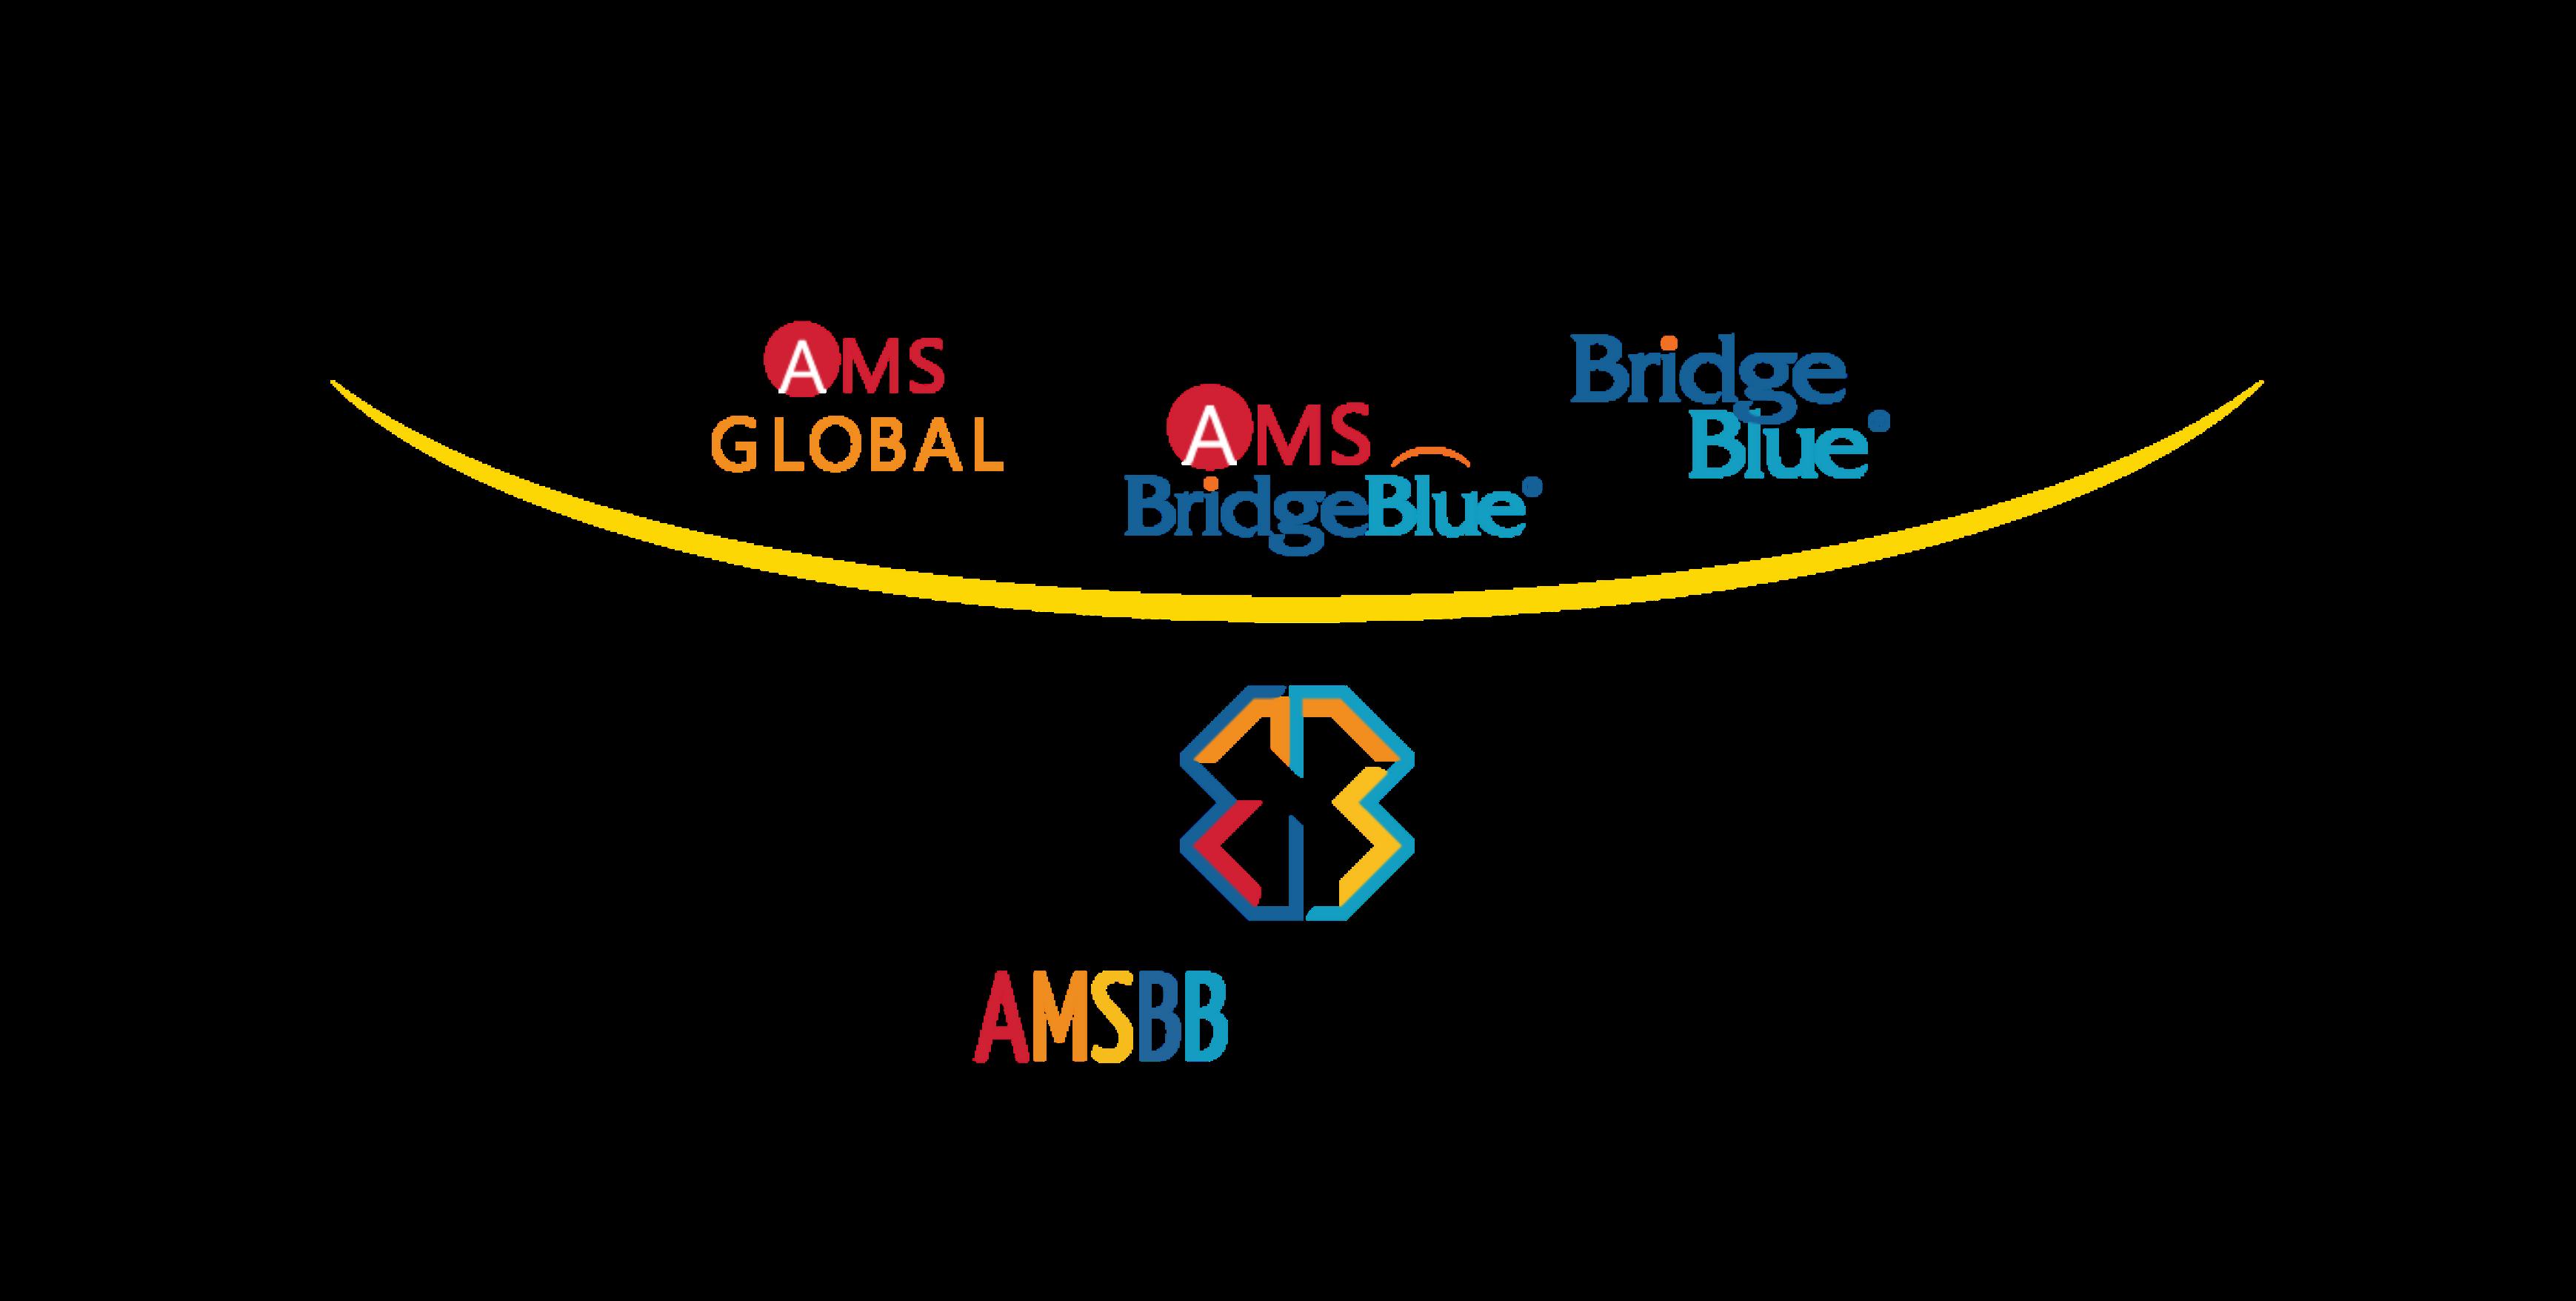 AMSBB GROUP